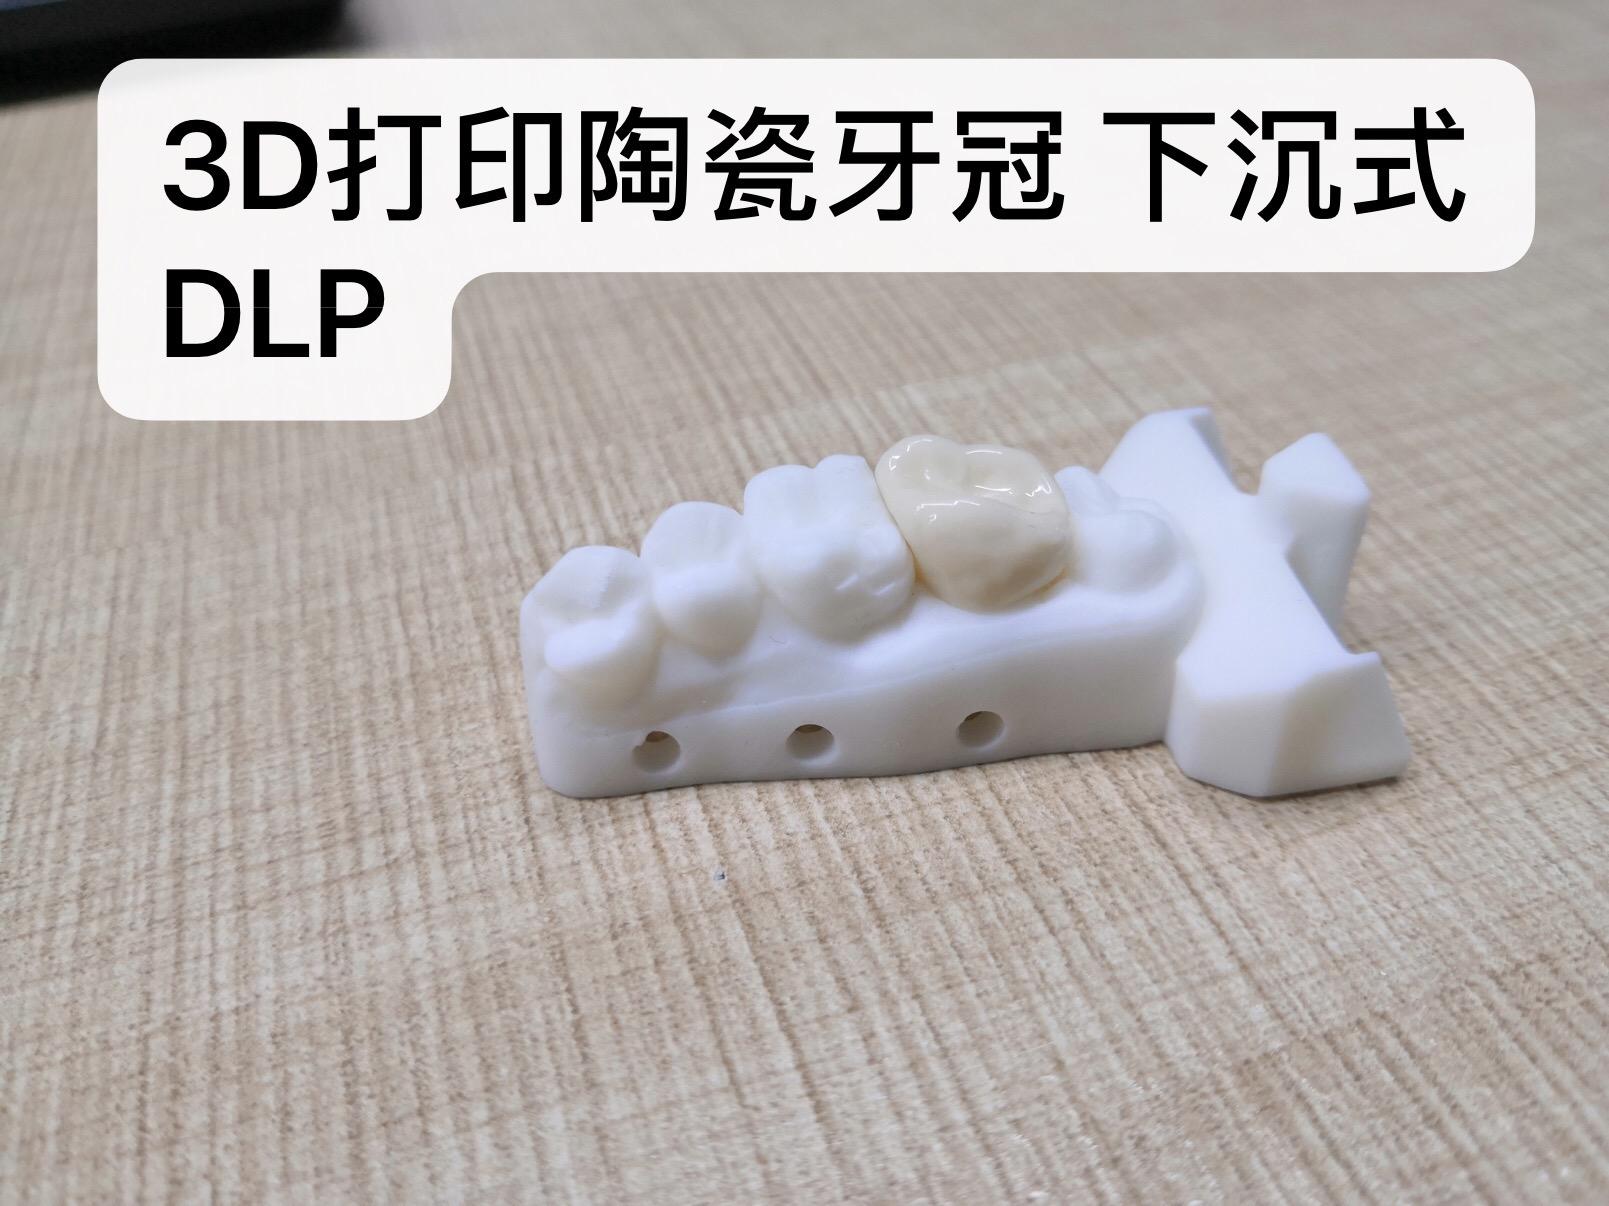 OctaveLight下沉式DLP光固化3D打印机在数字化蜂窝陶瓷技术的应用(3D打印氧化钛氧化锆氧化铝)